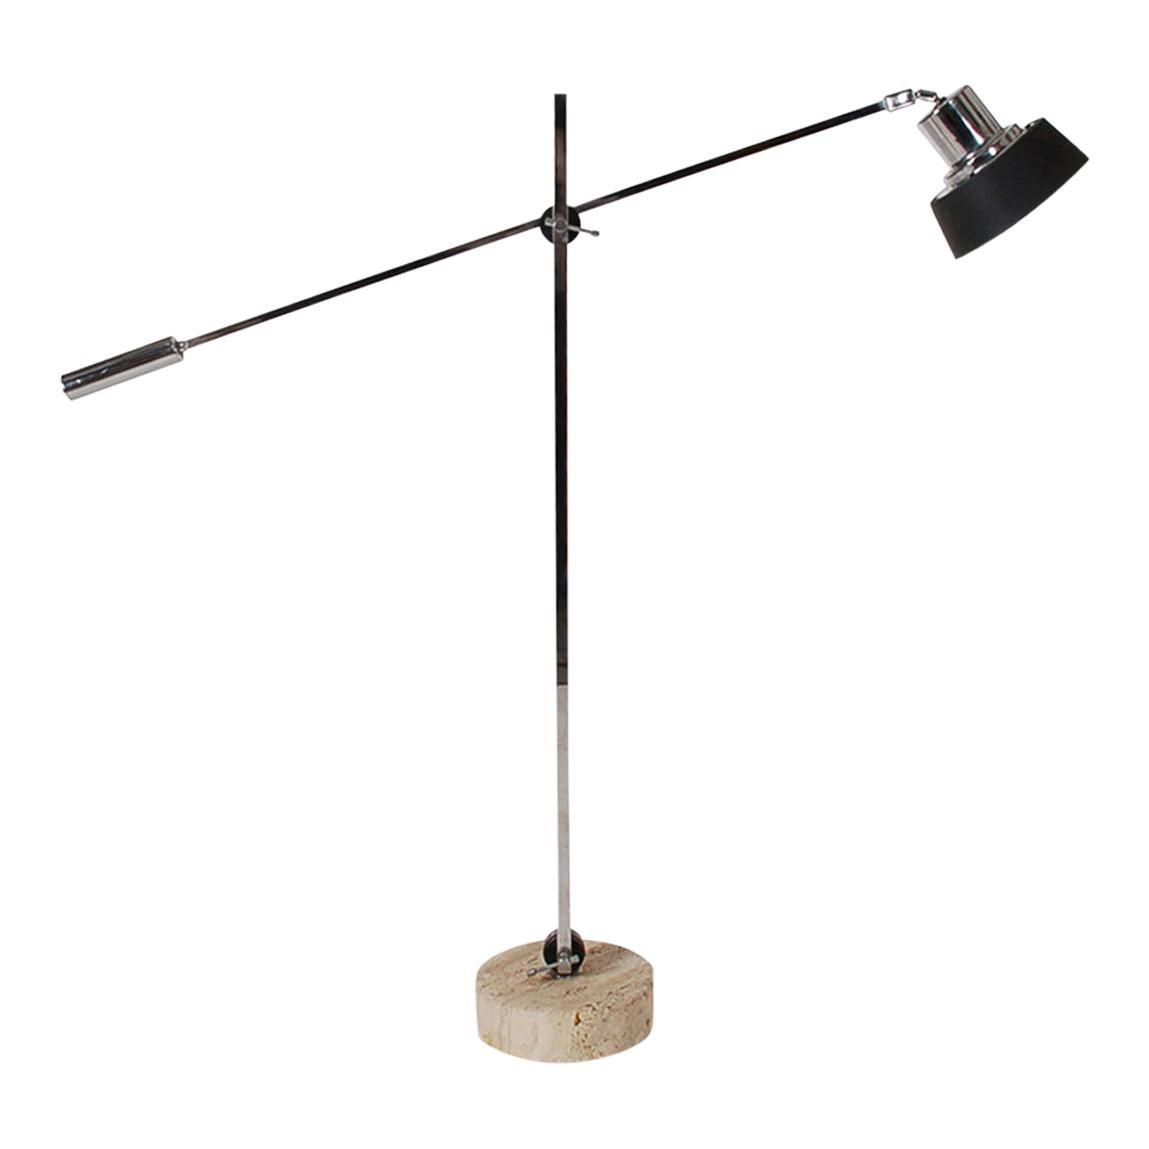 Adjustable Midcentury Postmodern Italian Floor Lamp in Chrome and Travertine